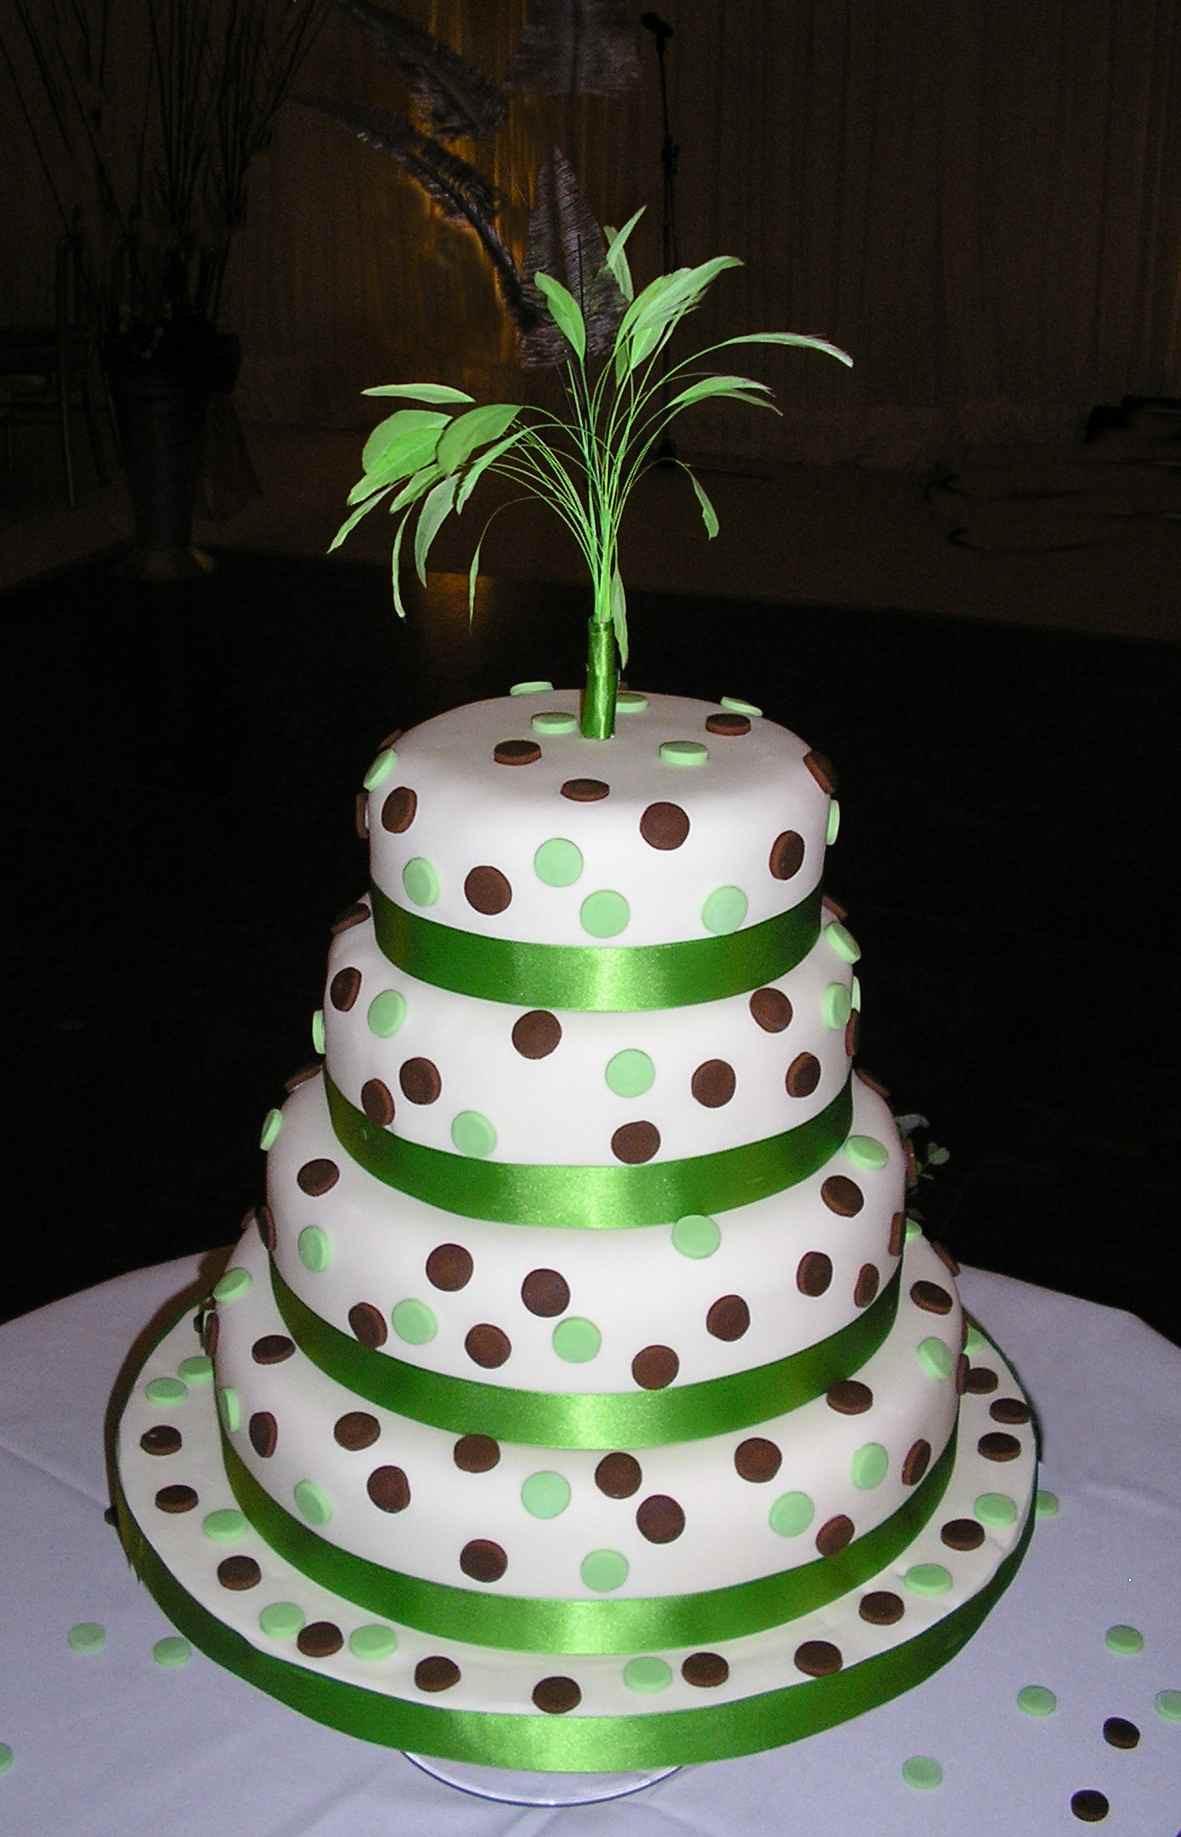 Polka Dots Wedding Cakes  Polka Dot Cakes – Decoration Ideas